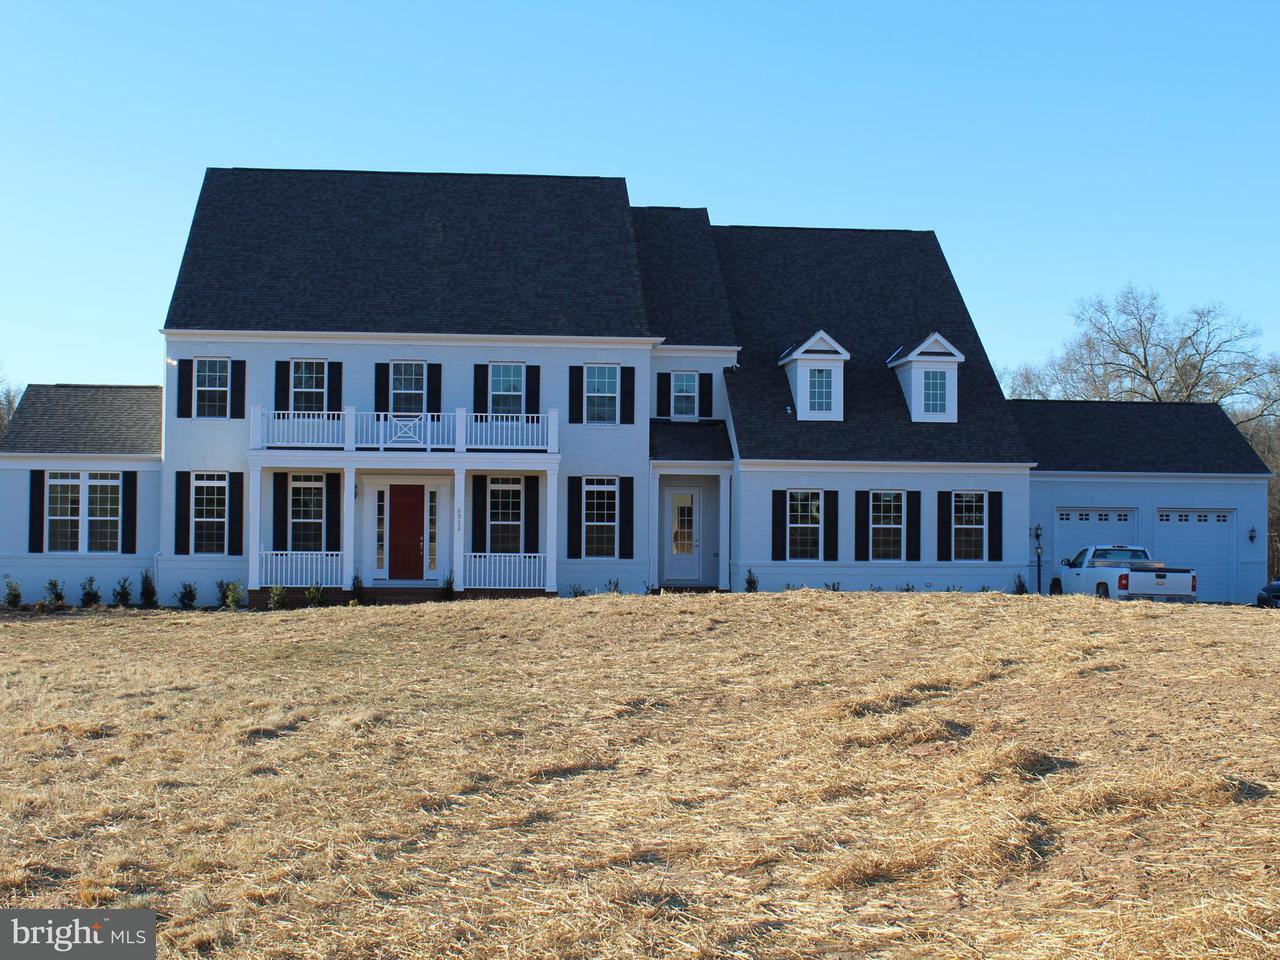 Vivienda unifamiliar por un Venta en 6912 Chelnham Court 6912 Chelnham Court Centreville, Virginia 20120 Estados Unidos